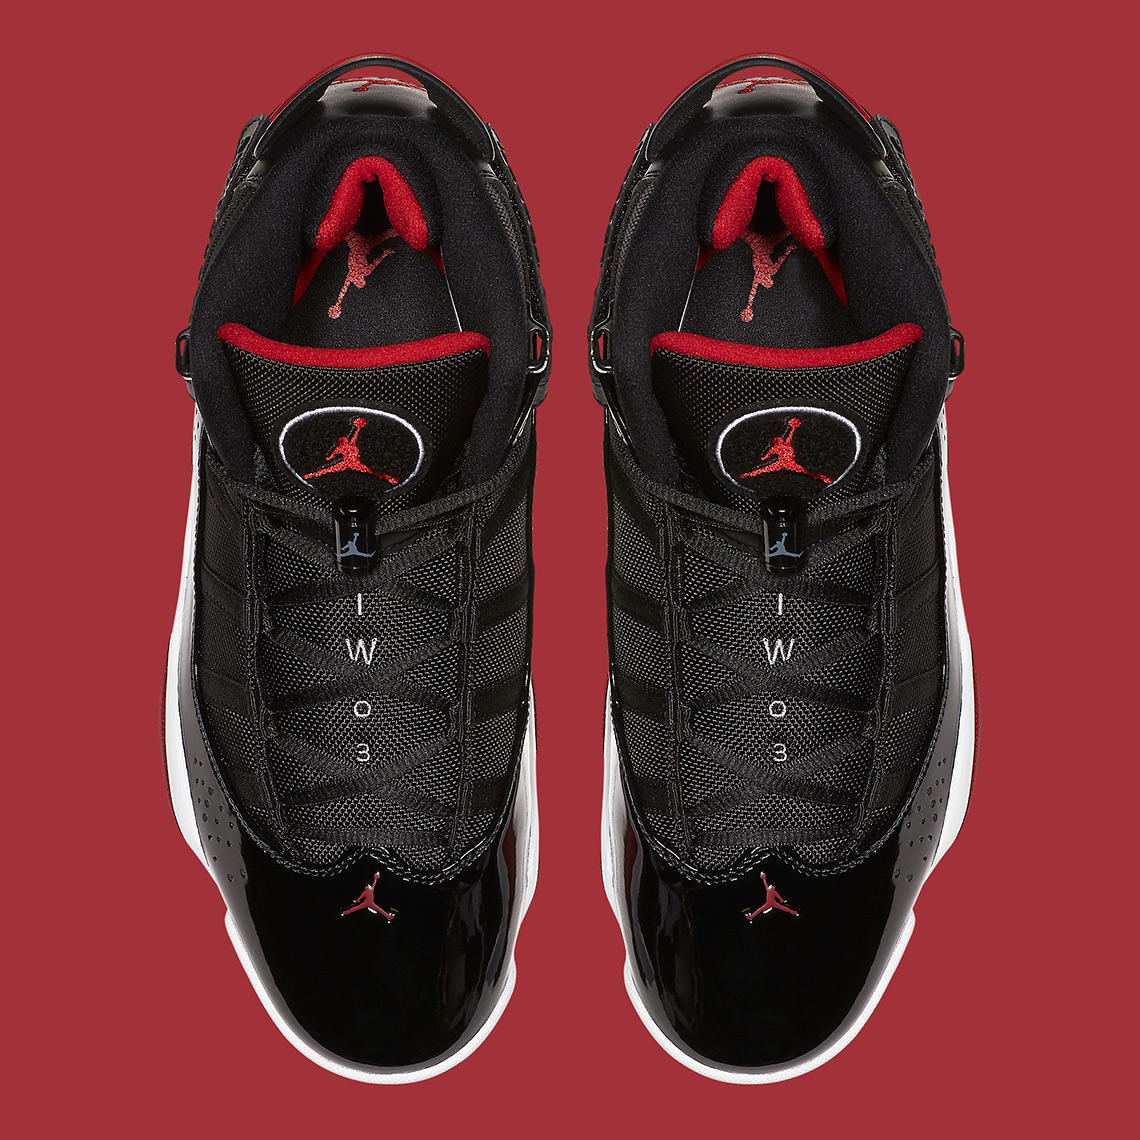 outlet store e766e 8dadf Jordan 6 Rings Bred 322992-062 Release Info   SneakerNews.com